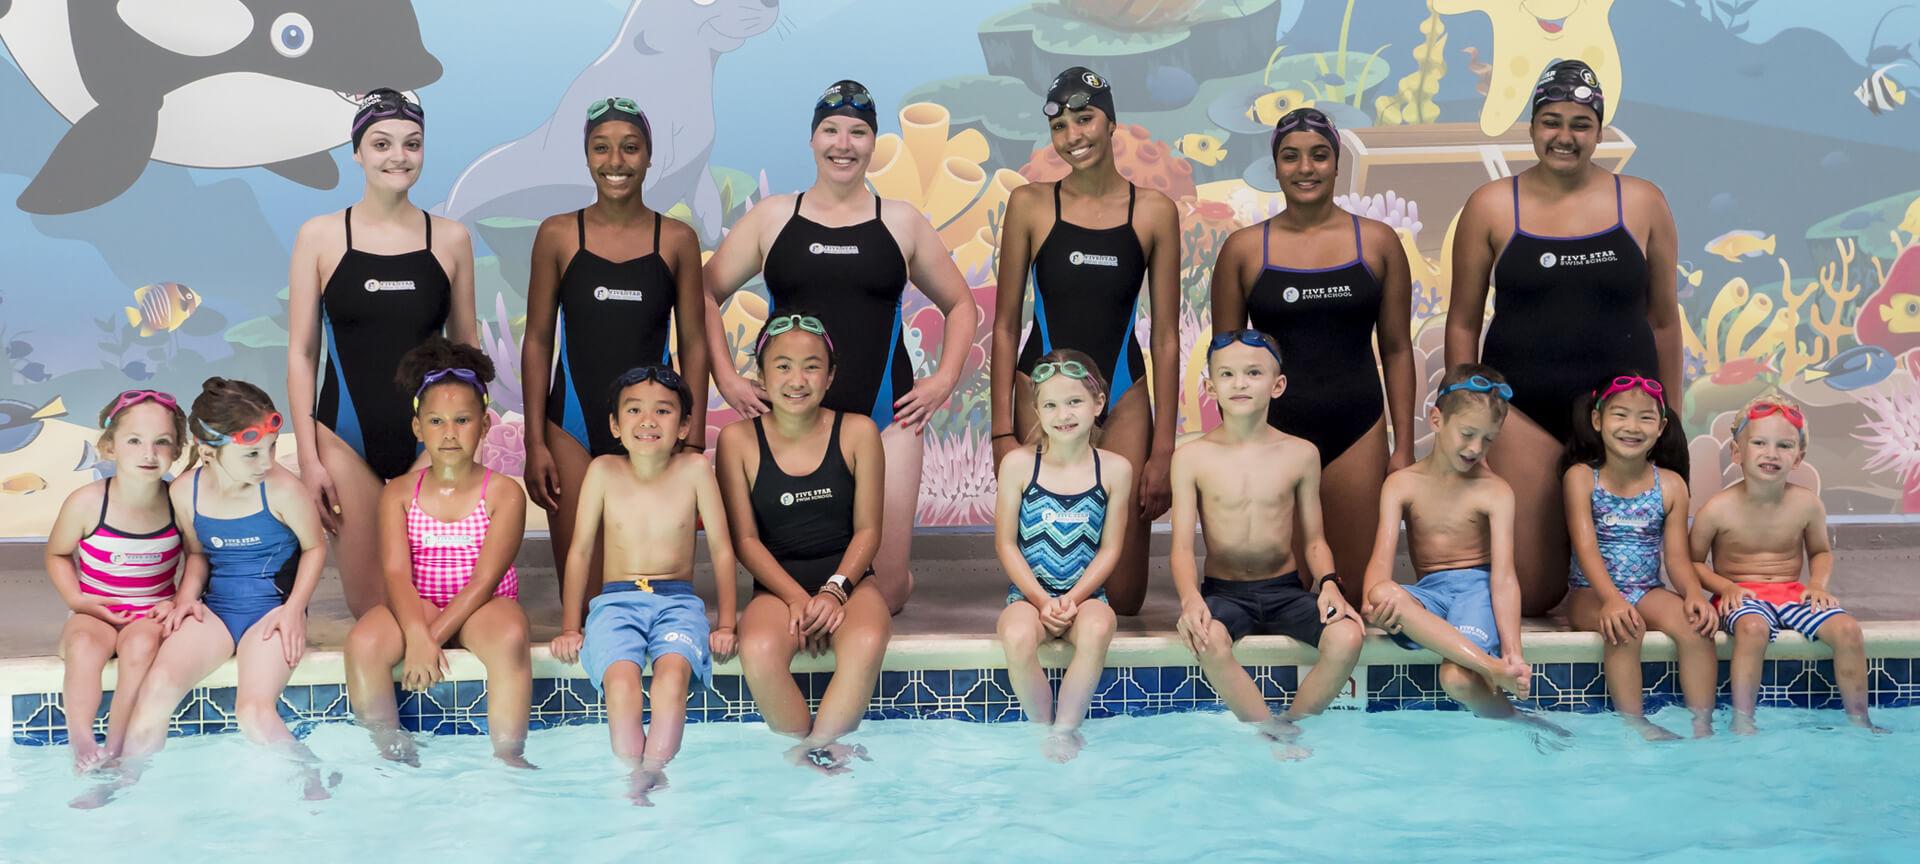 ddea64071dfb Home - Five Star Swim School - Swimming Lessons - Eatontown NJ ...